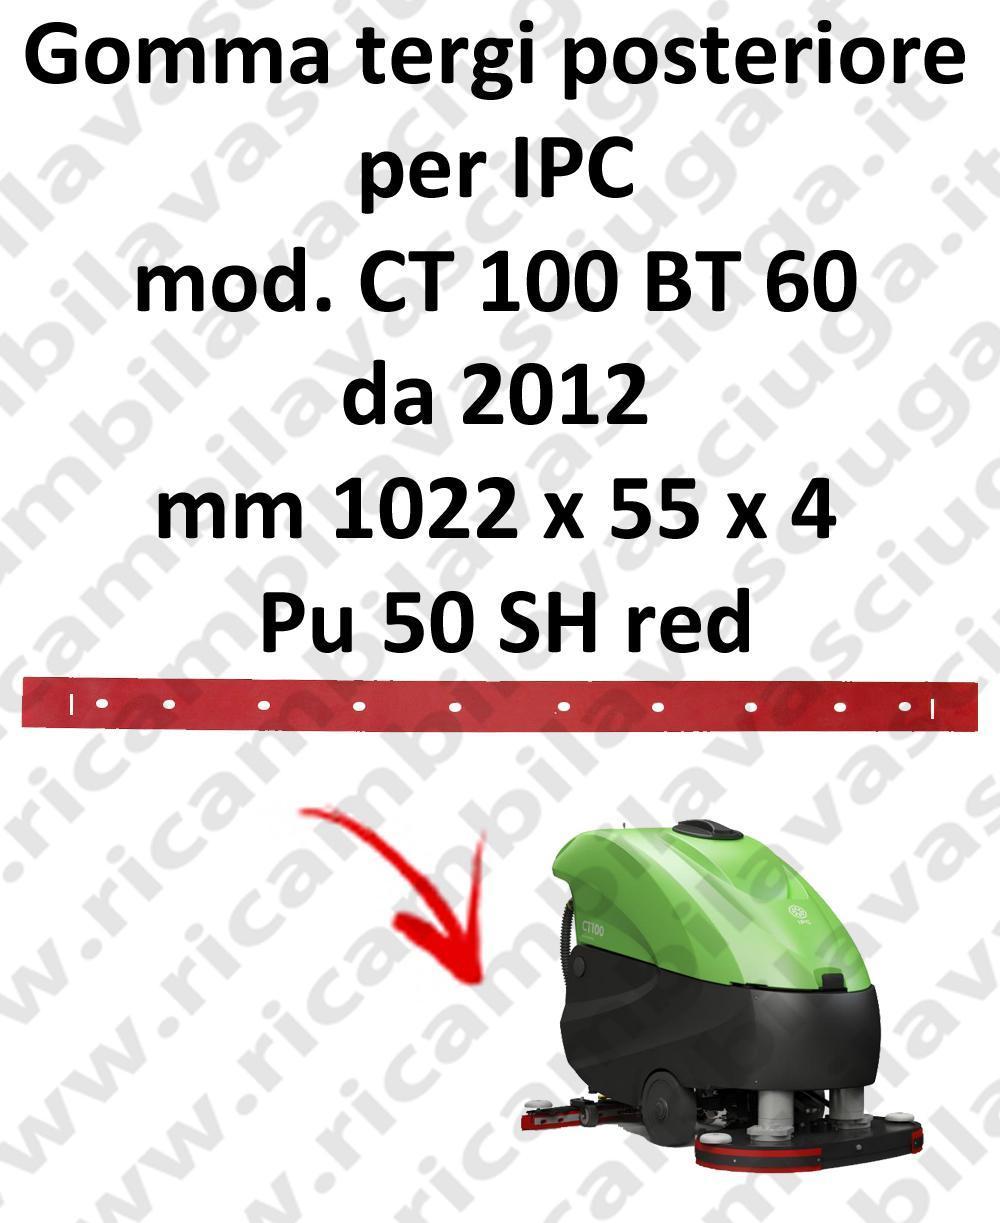 CT 100 BT 60 da 2012 goma de secado trasero para IPC